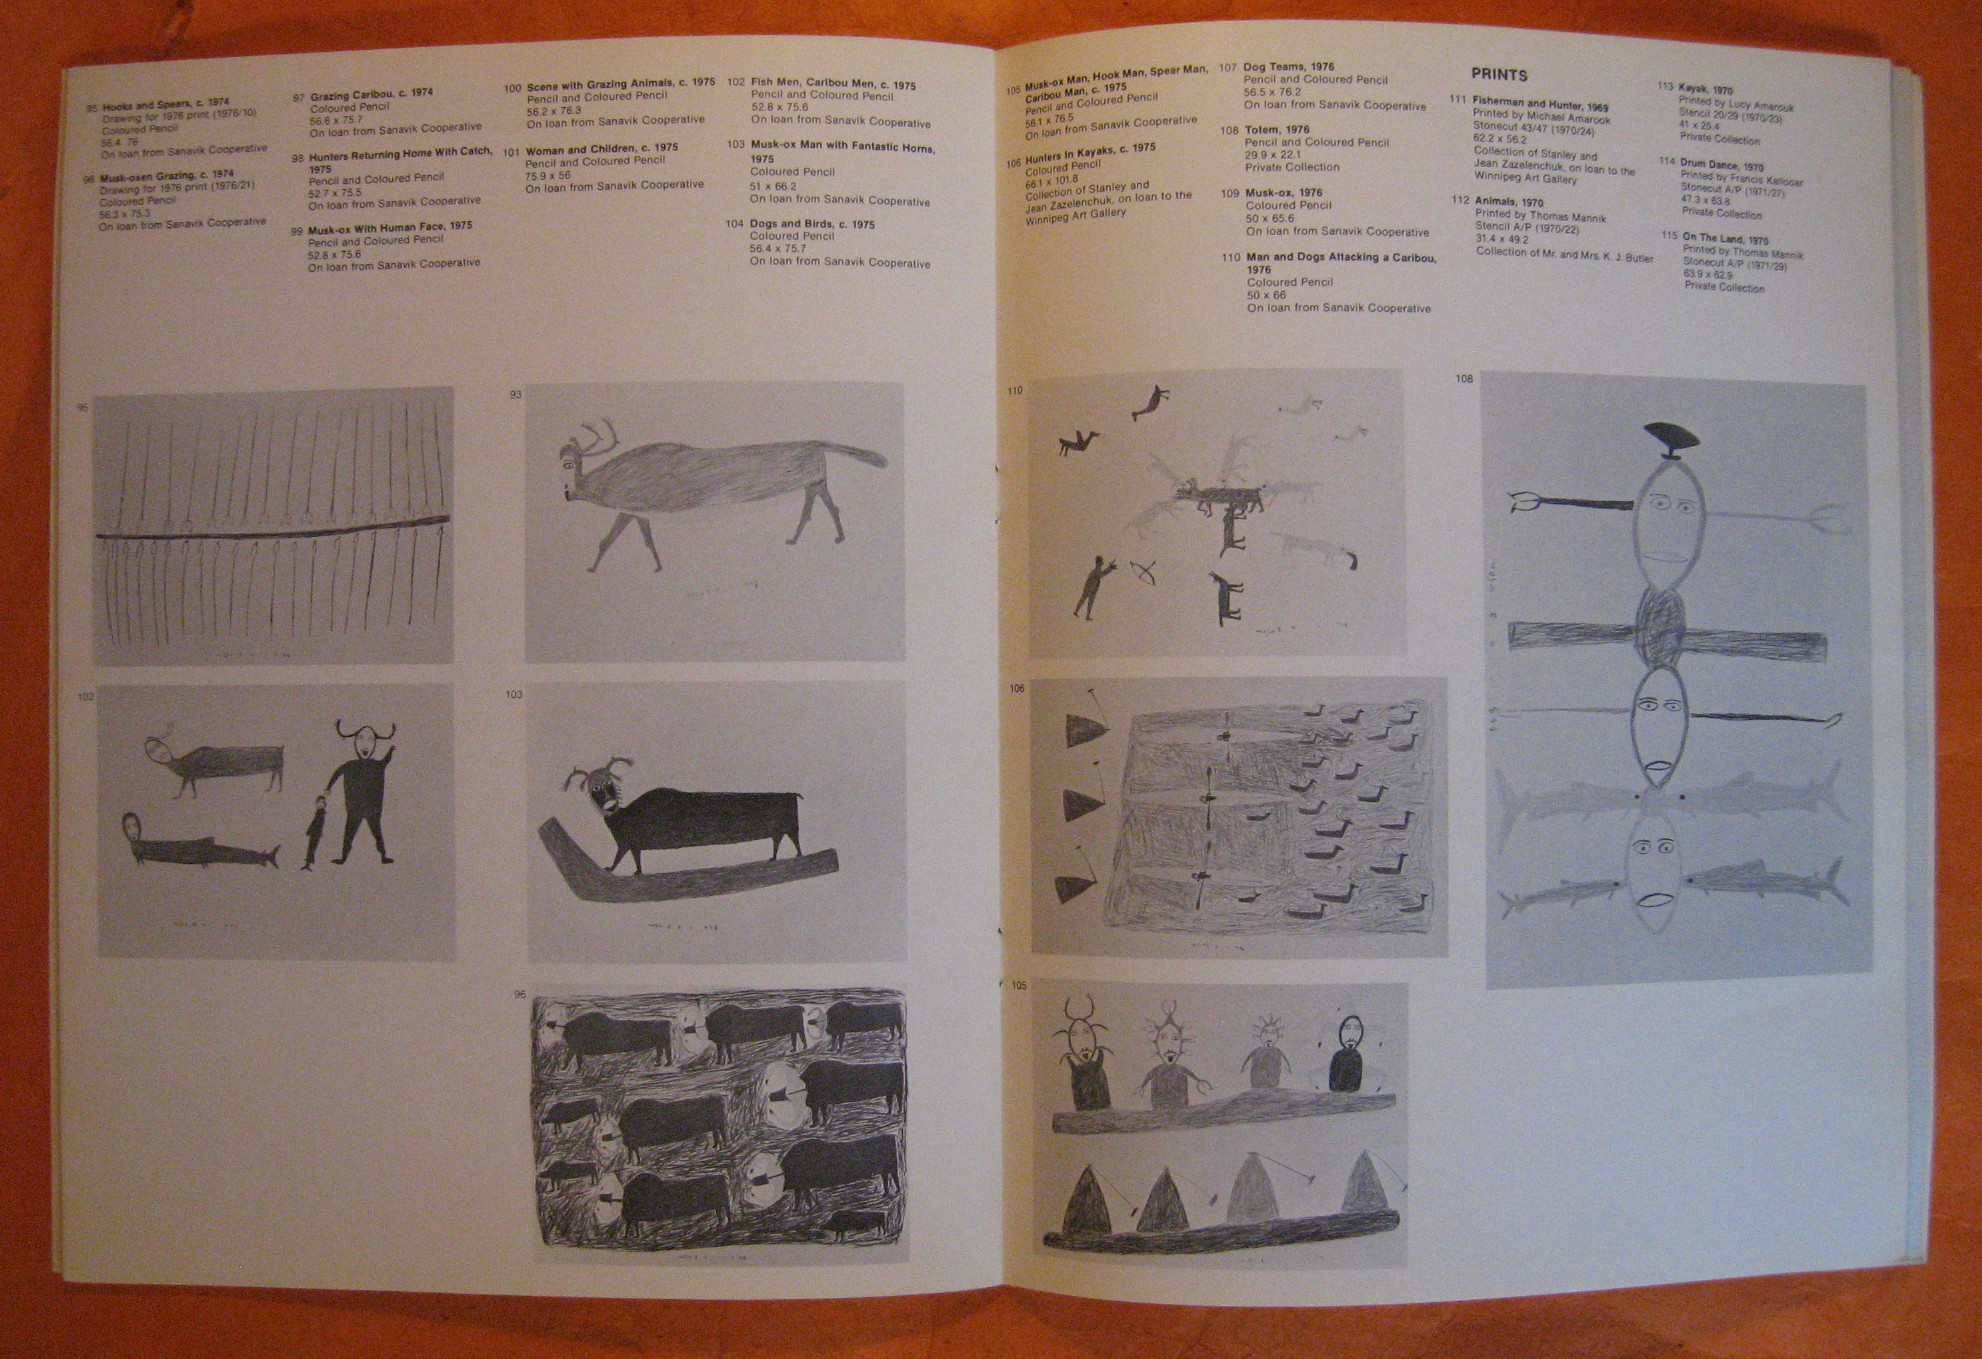 Image for Tuu'luq/Anguhadluq:  An Exhibition of Works By Marion Tuu'luuq and Luke Anguhadluq of Baker Laker